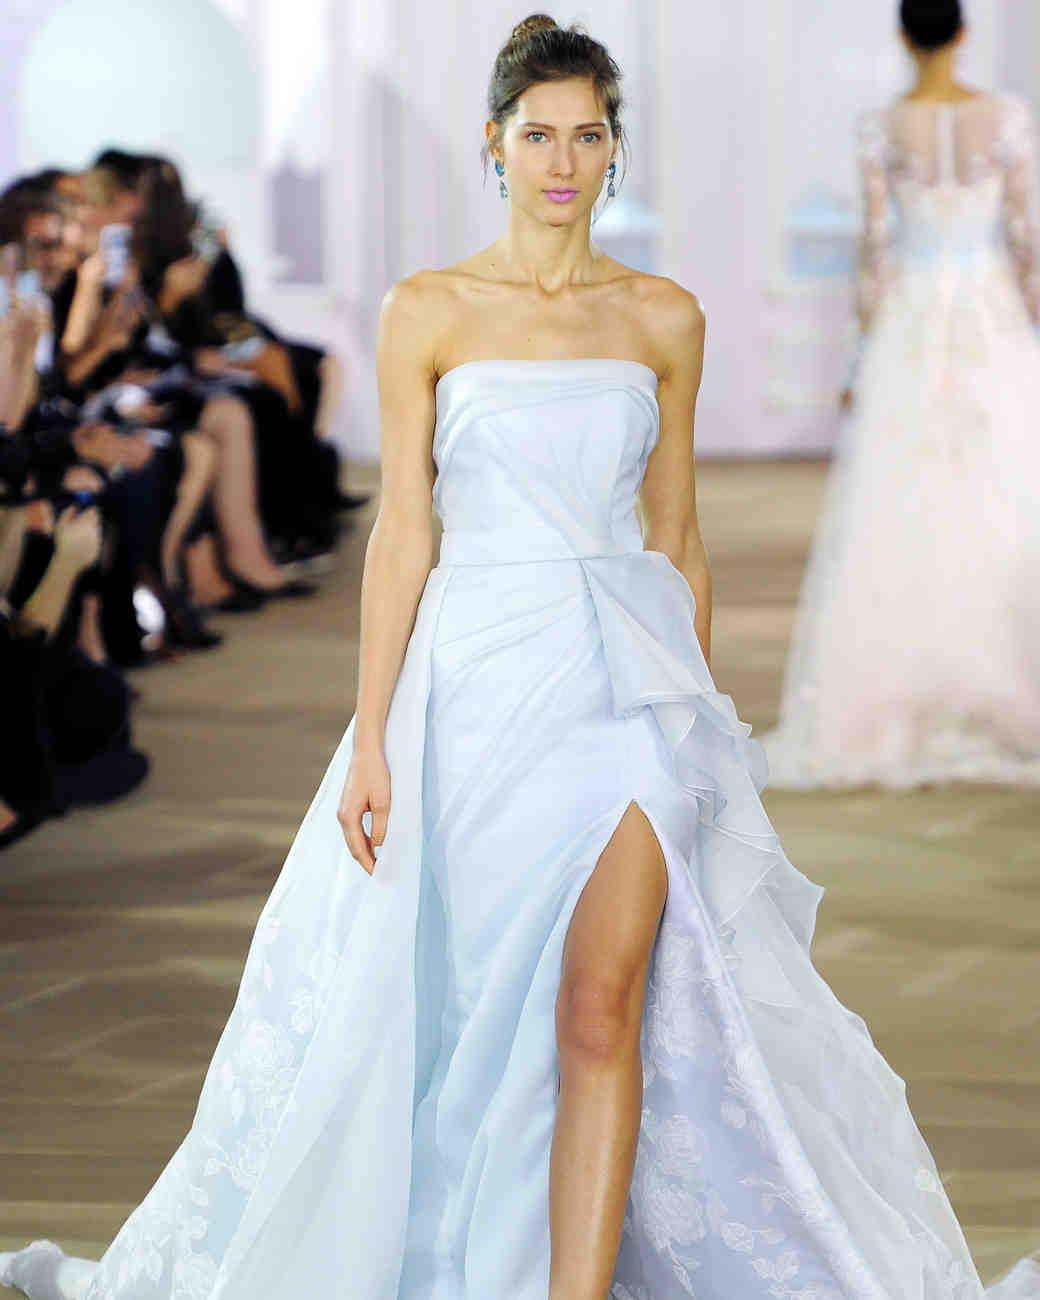 Wedding Dress Top Falls Down